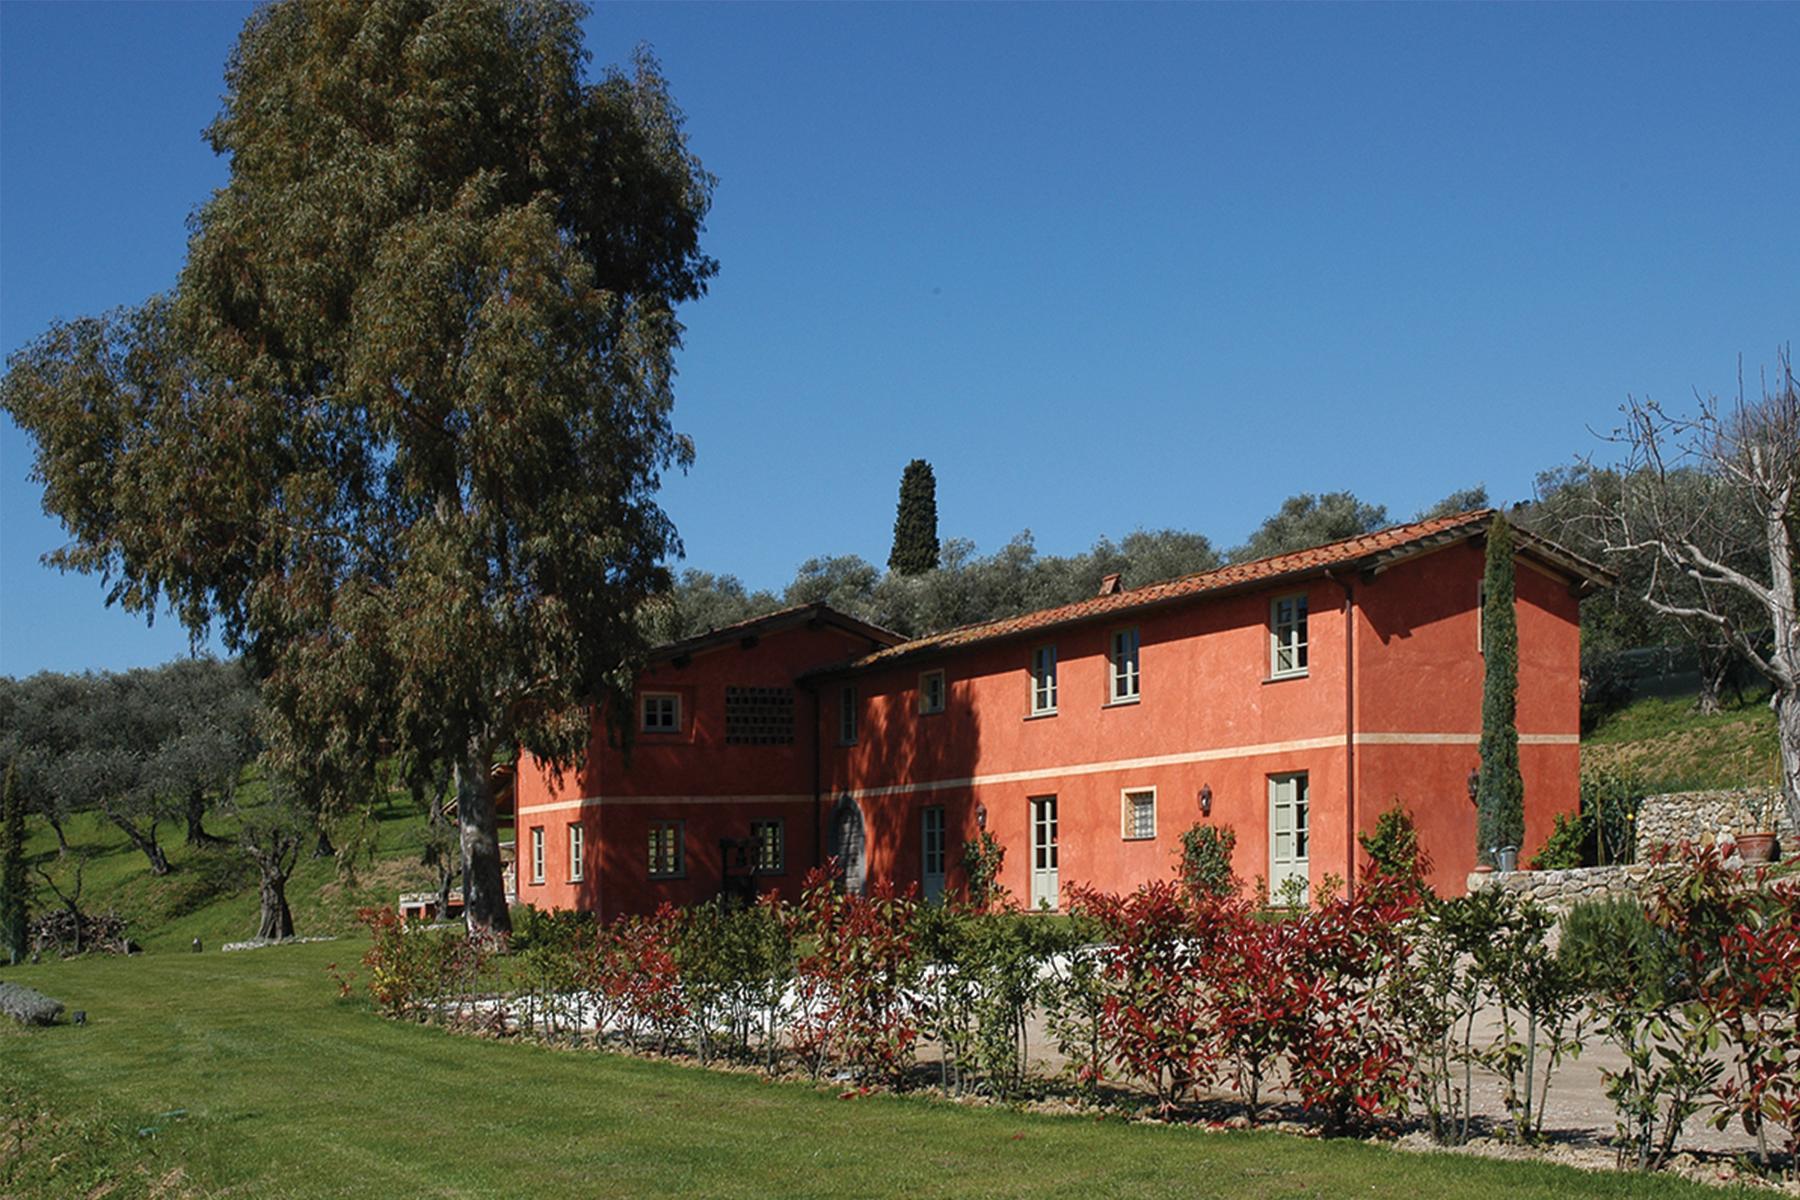 Casa indipendente in Vendita a Massarosa:  5 locali, 350 mq  - Foto 1